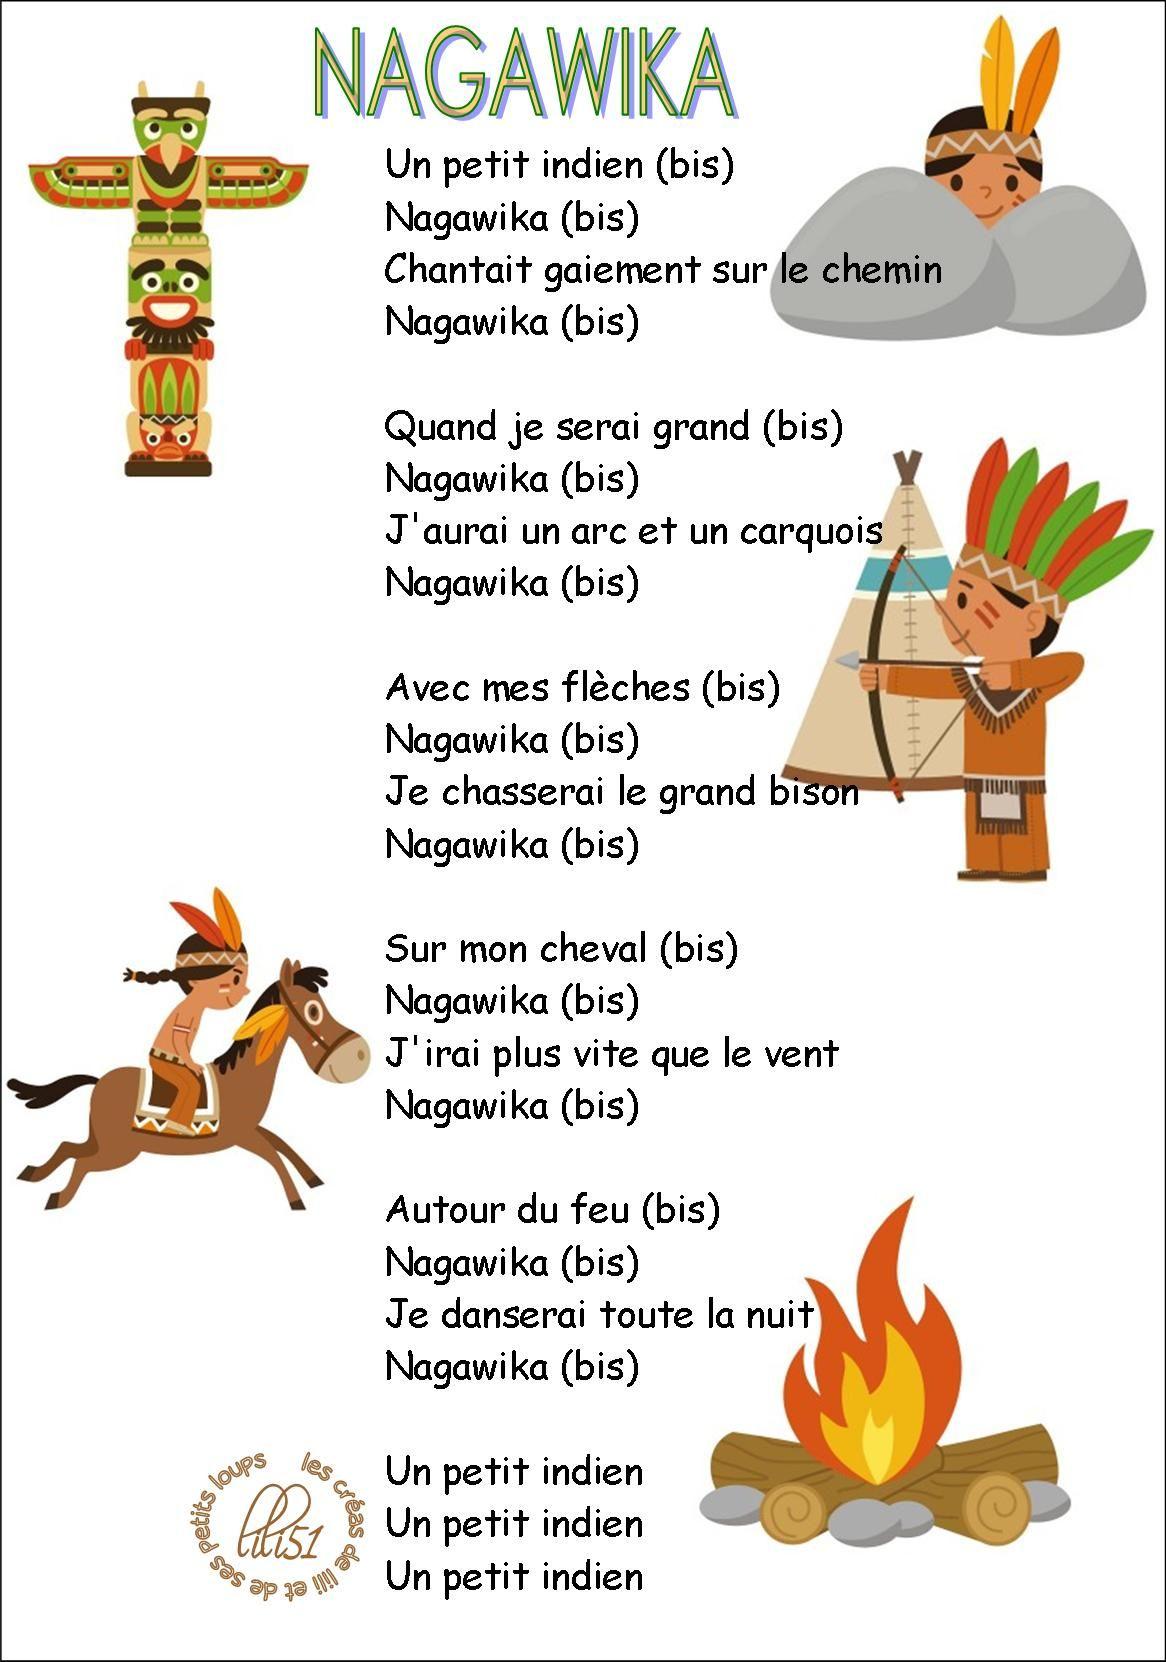 Nagawika | Comptines, Chansons Pour Enfants, Chant Pour Enfant avec Chanson Pour Les Animaux